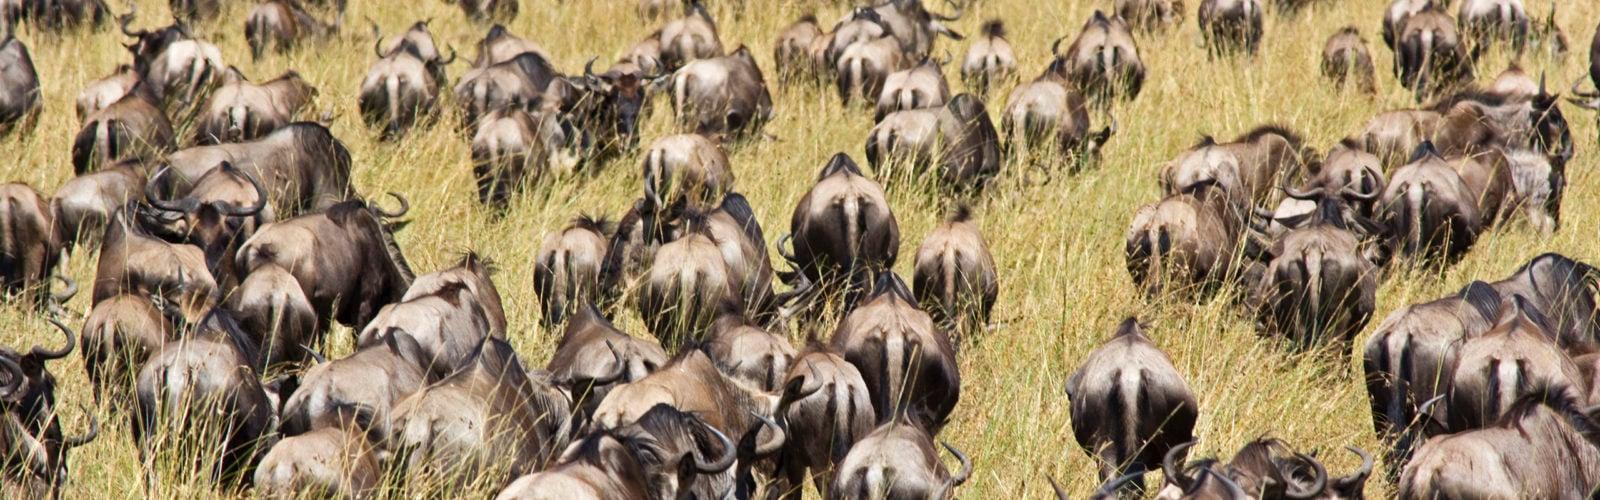 Wildebeest Great Migration